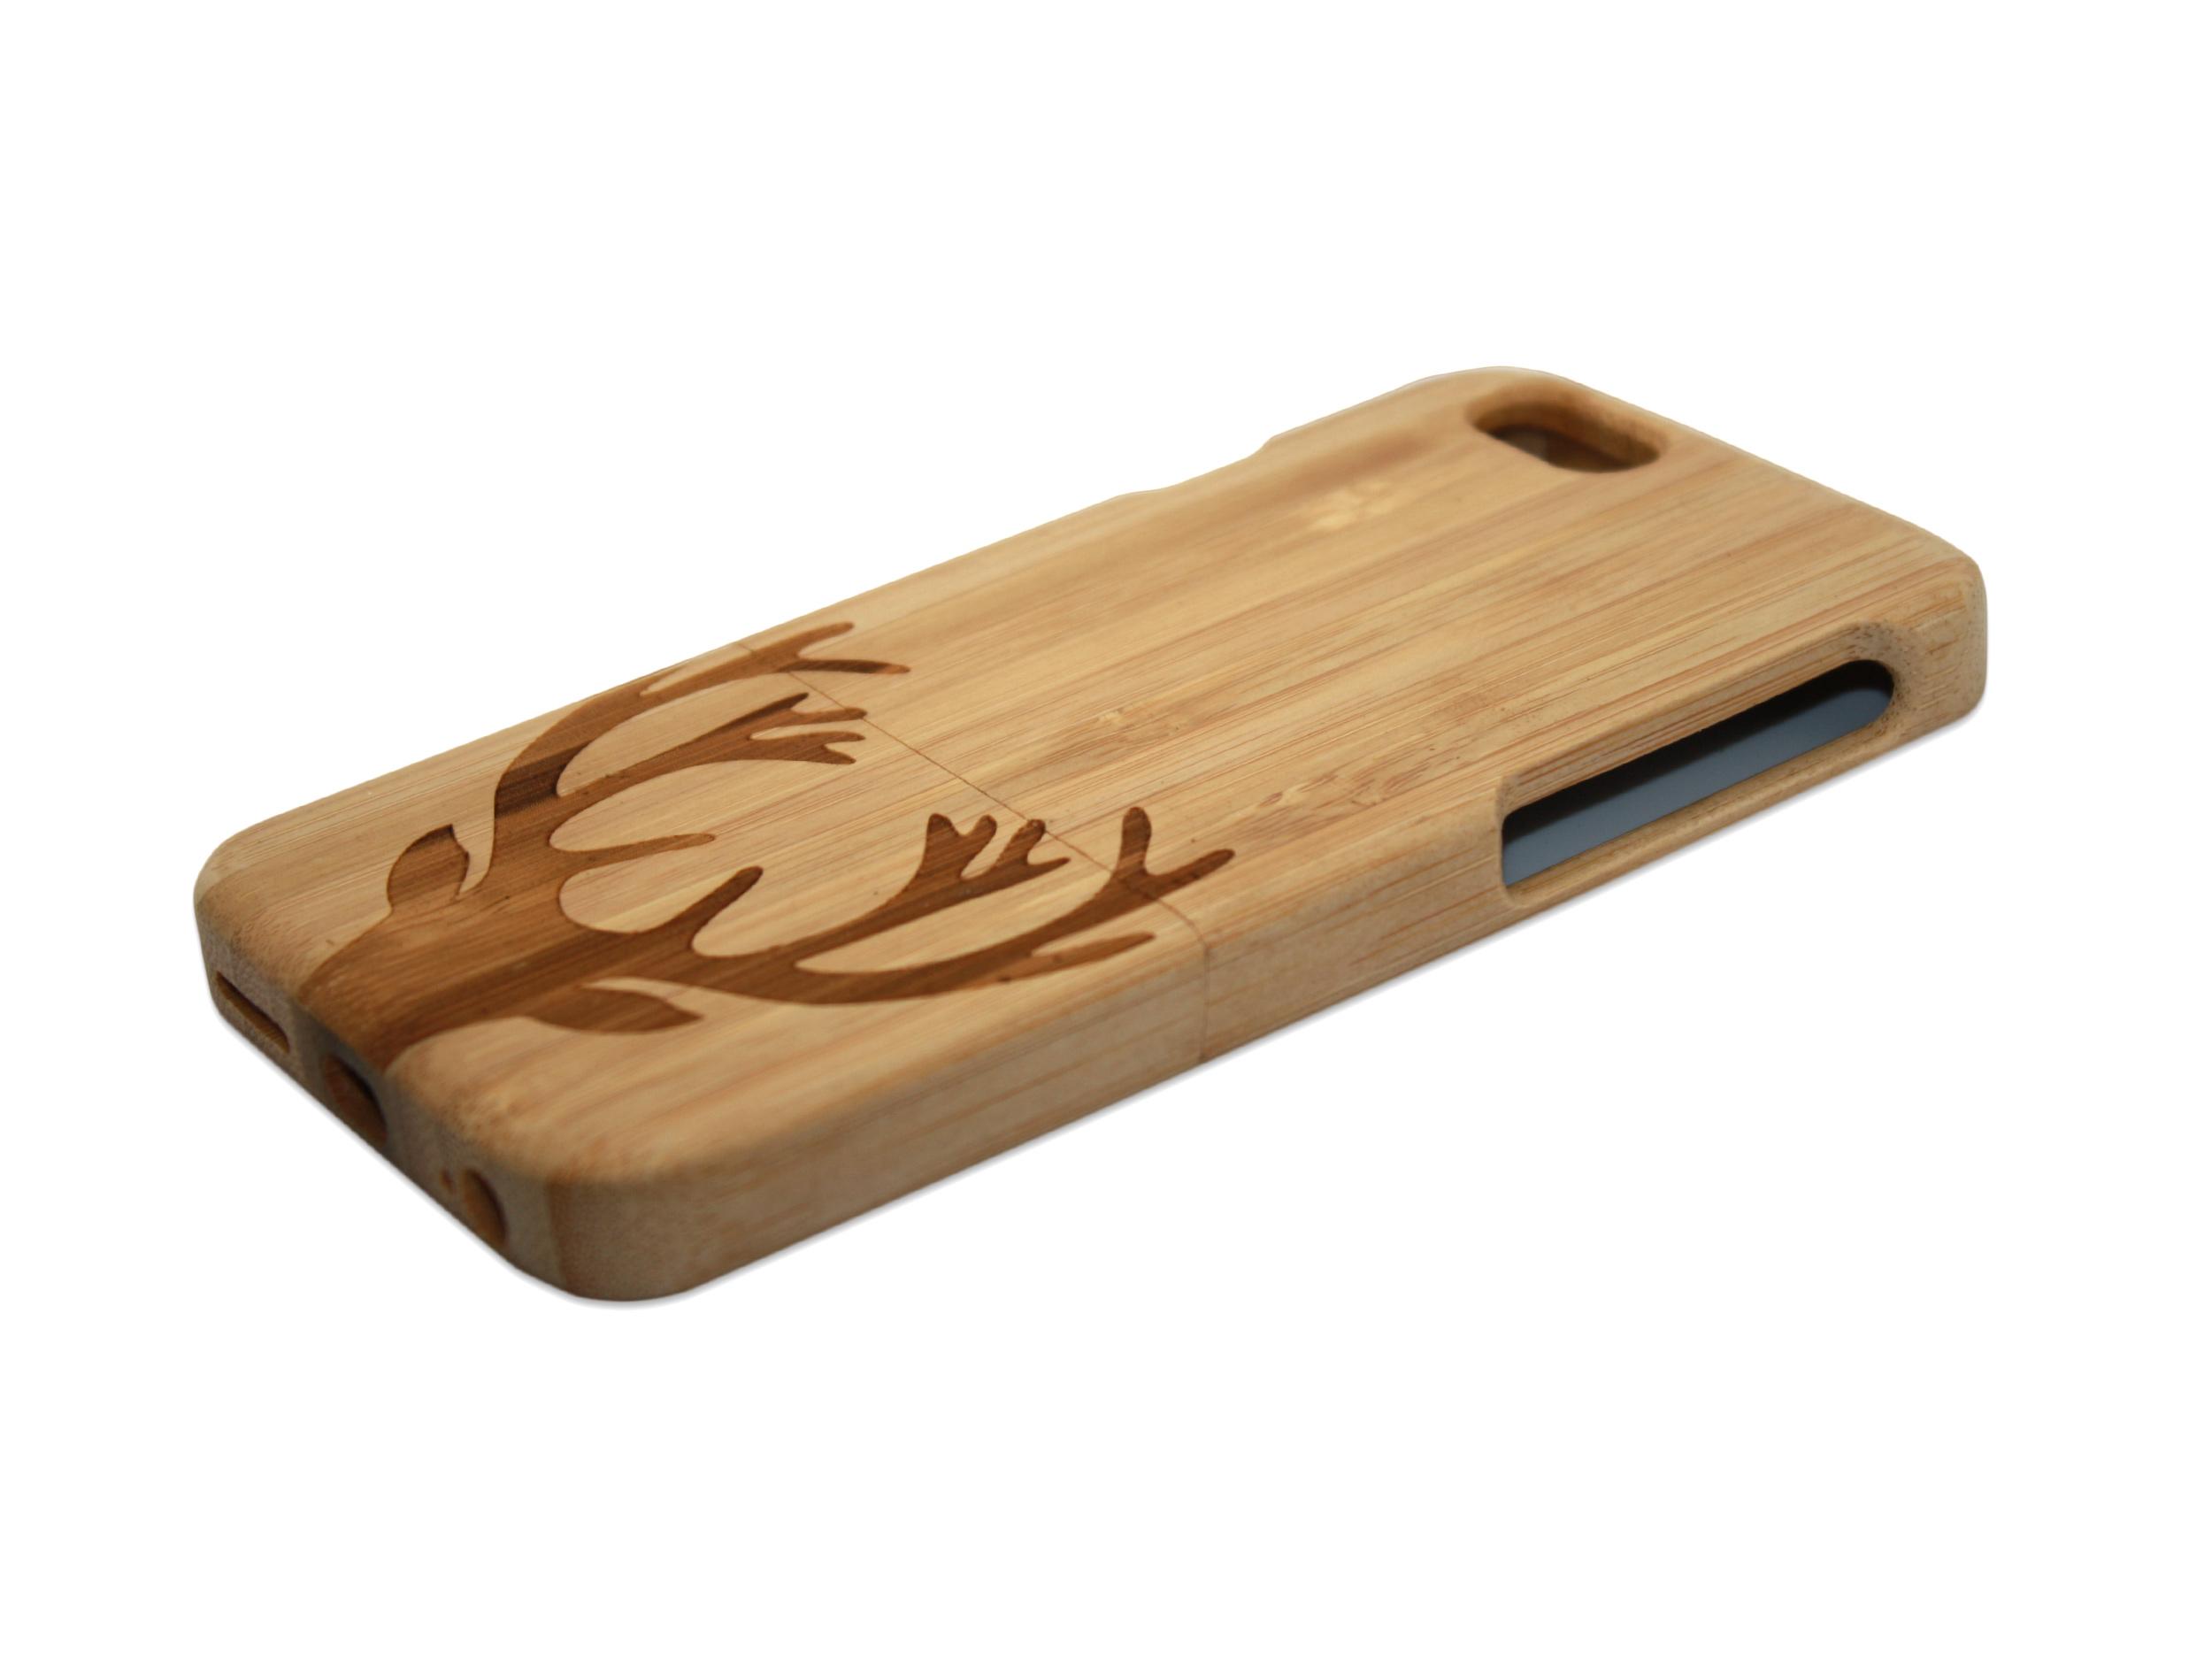 Samsung samsung galaxy phone cases : home shop wooden phone cases iphone 6 s iphone 6 phone case from ...